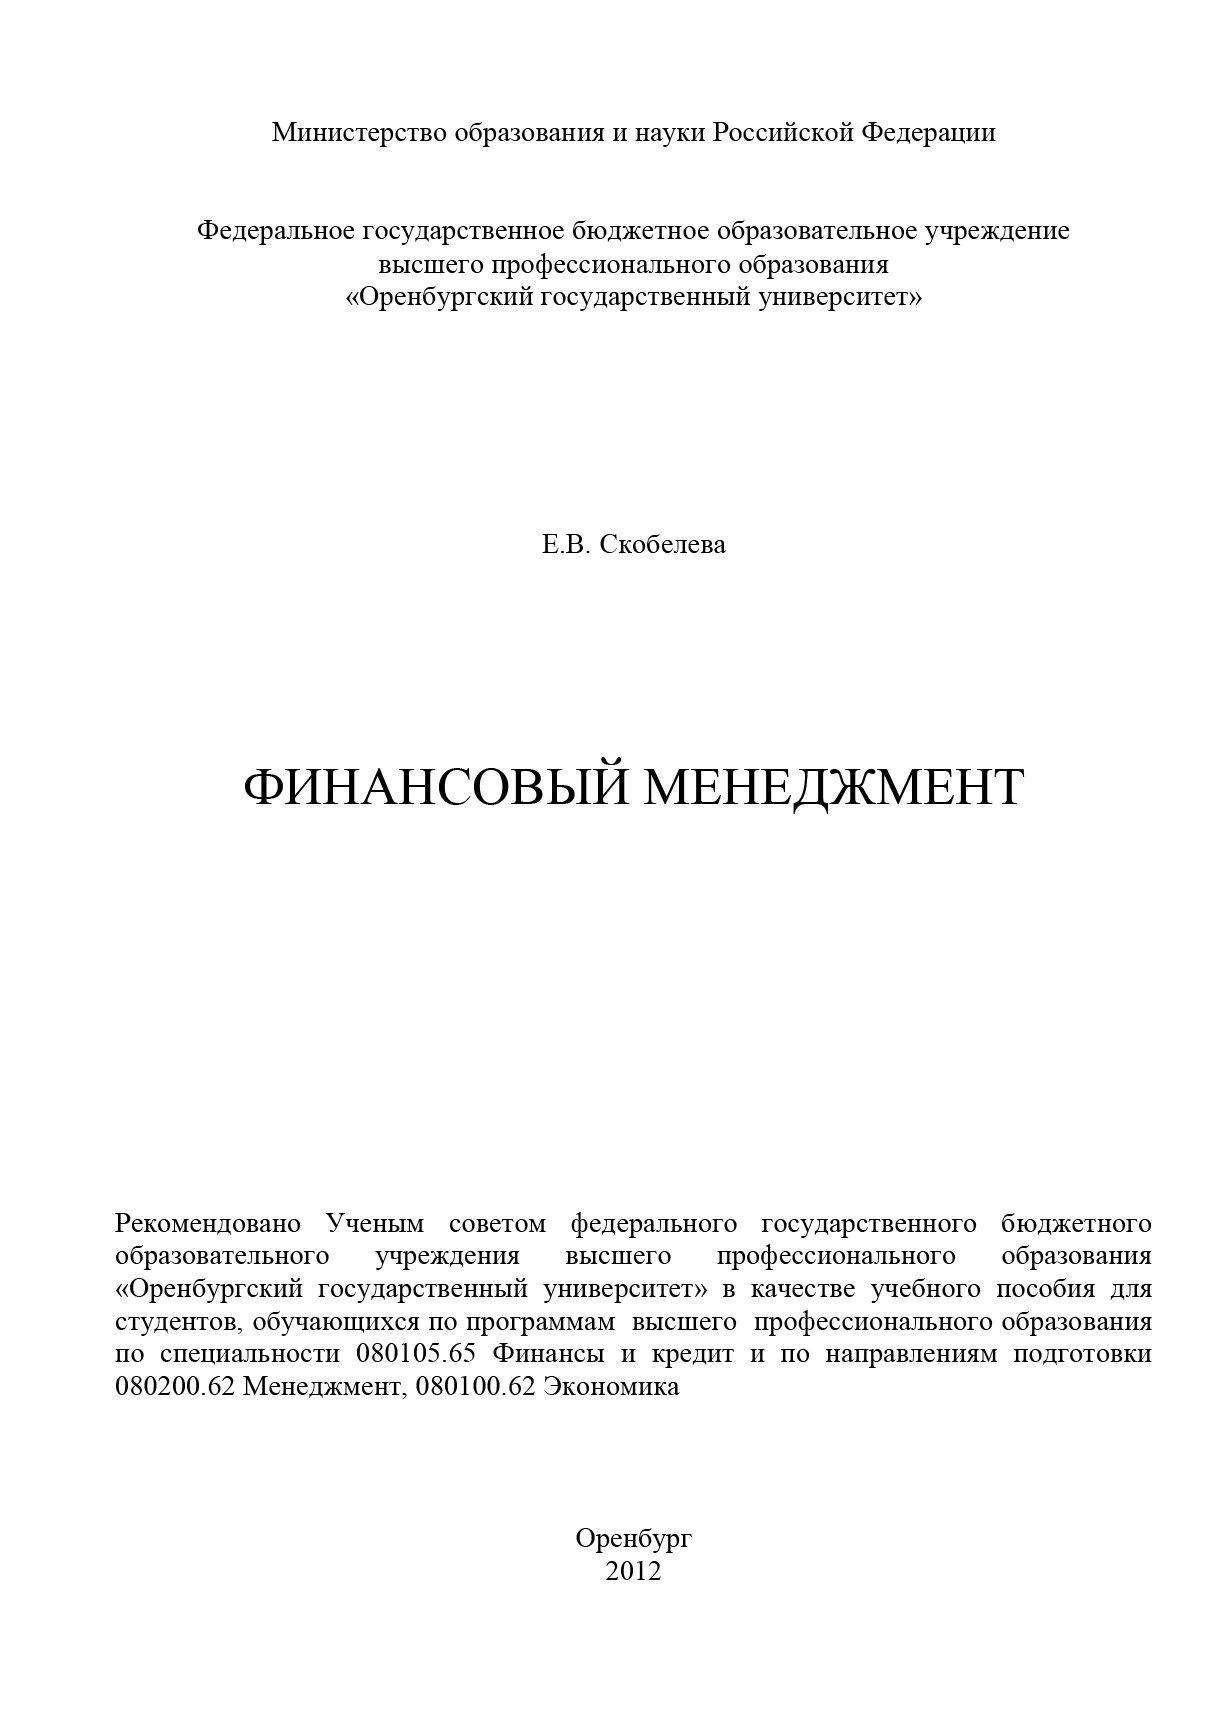 Обложка книги. Автор - Елена Скобелева